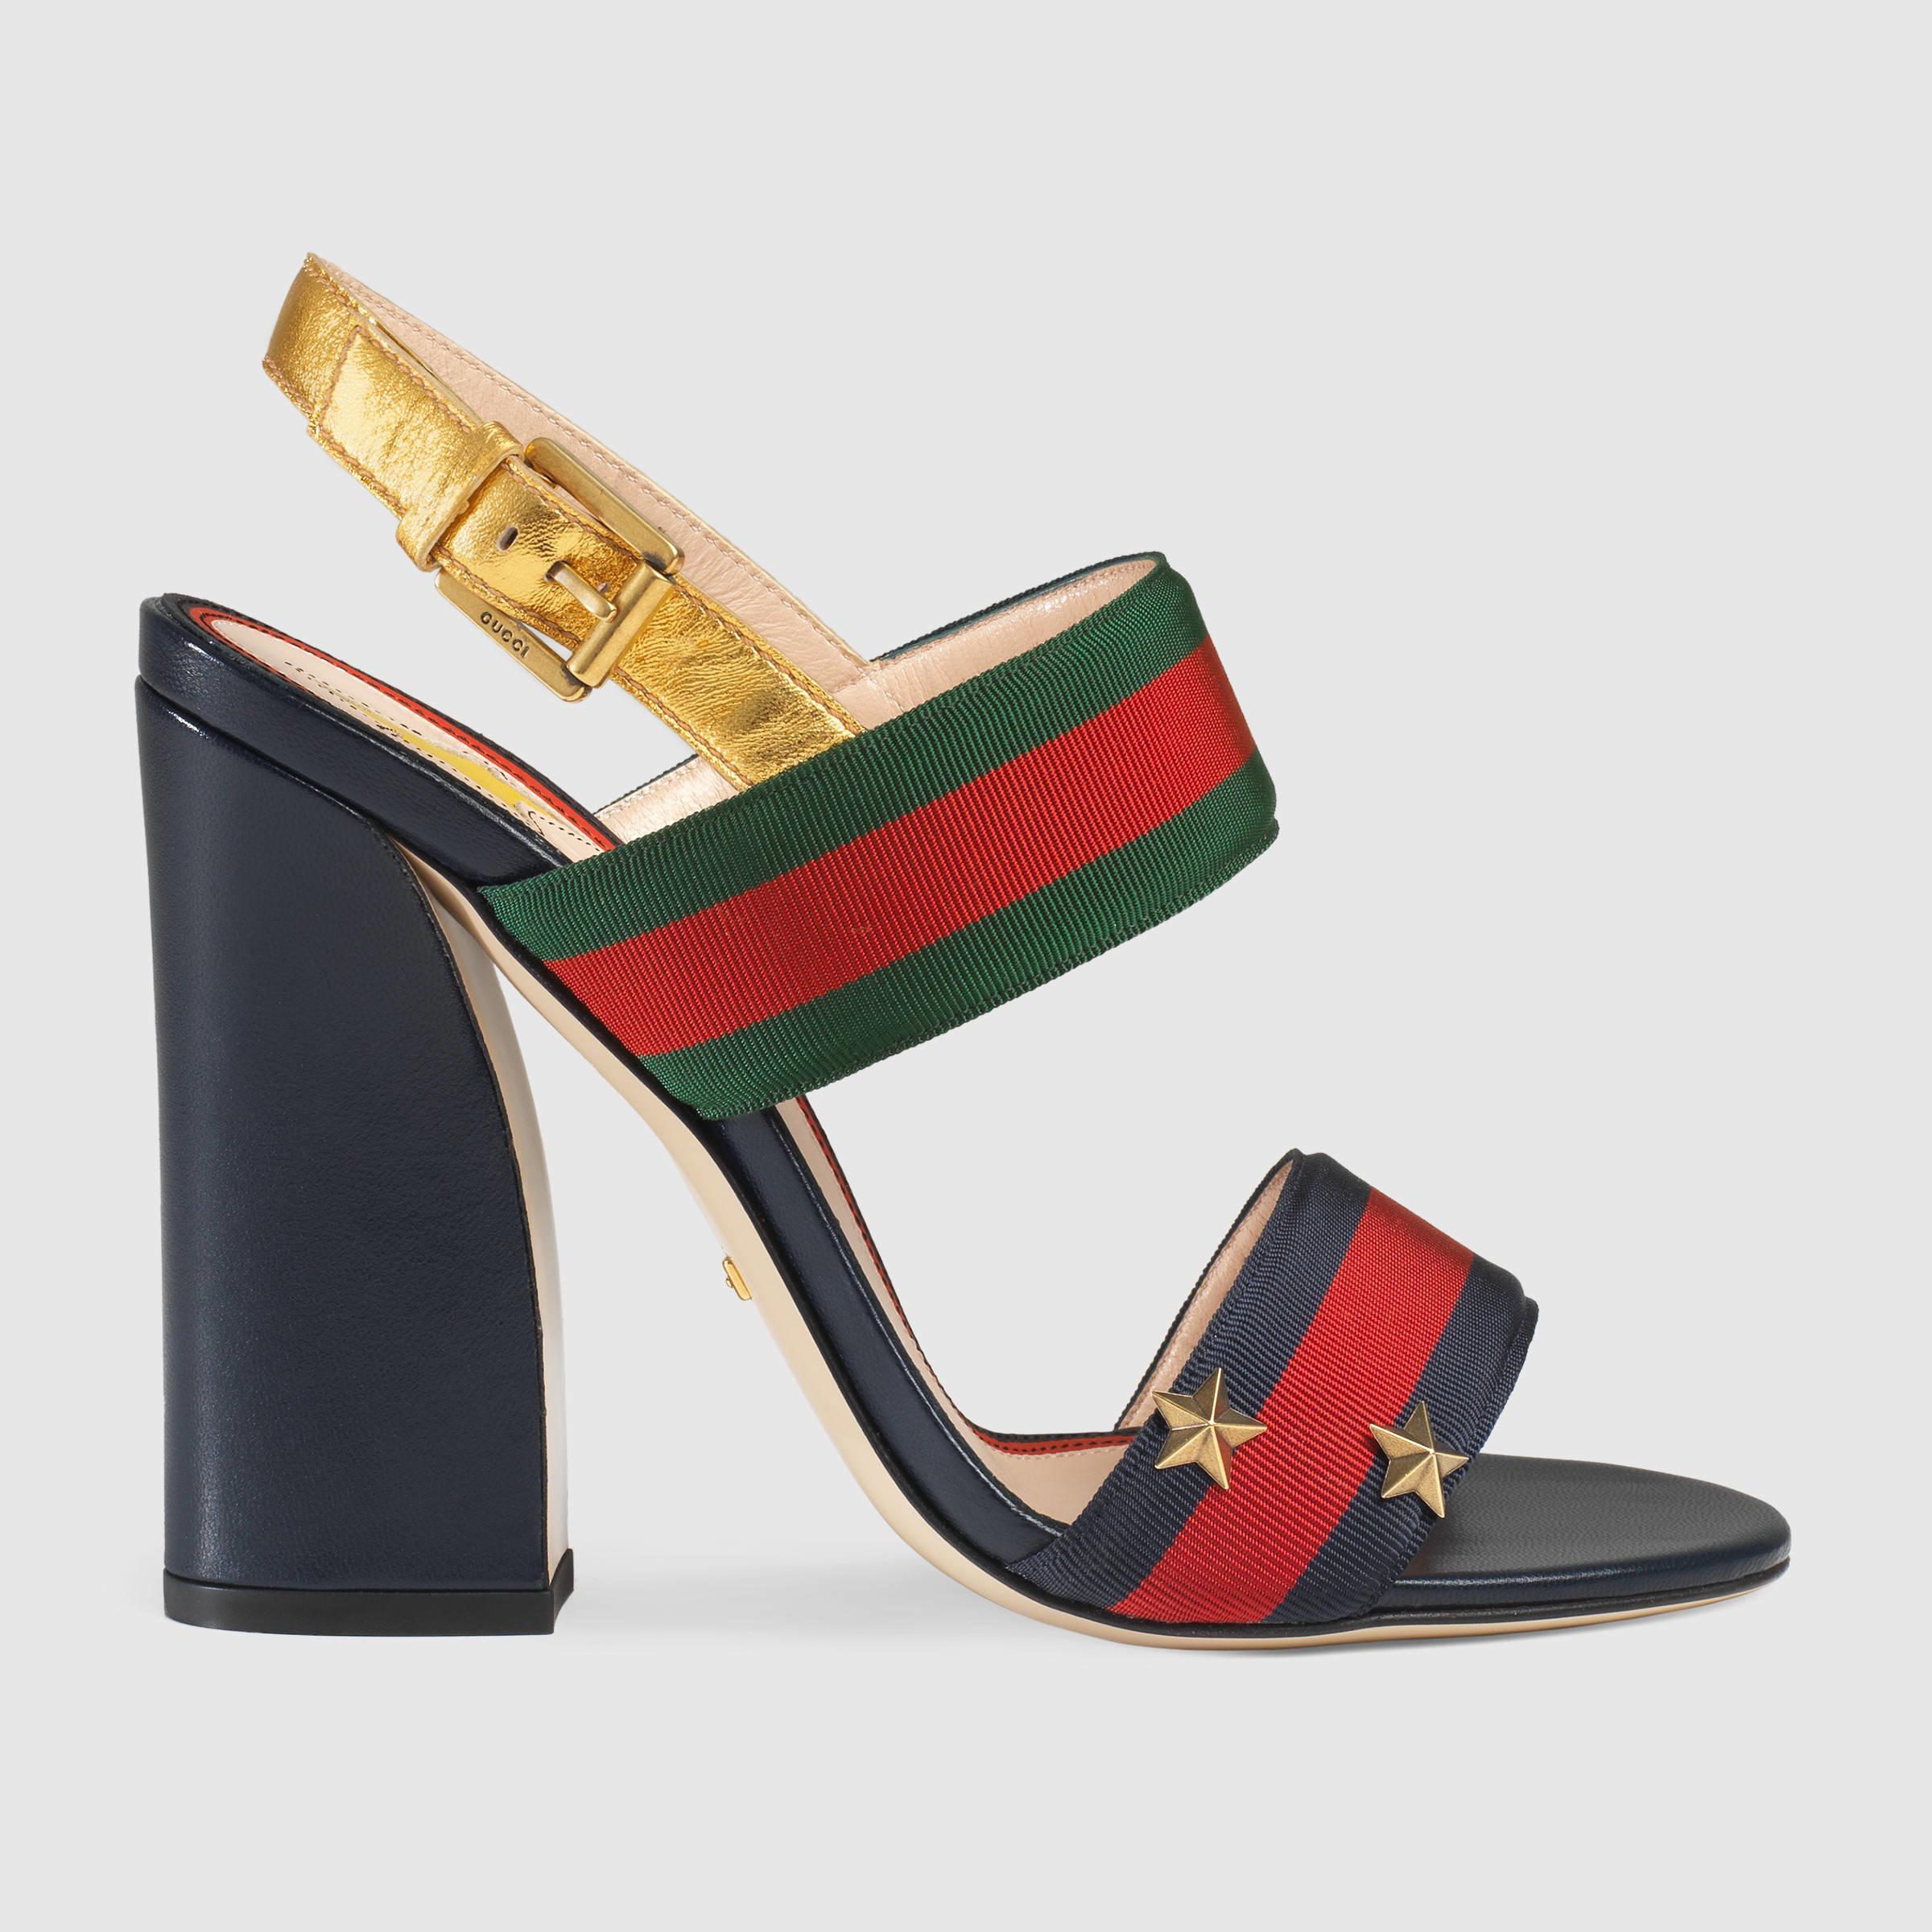 3760cb3eb Lyst - Gucci Grosgrain Web Sandal in Red